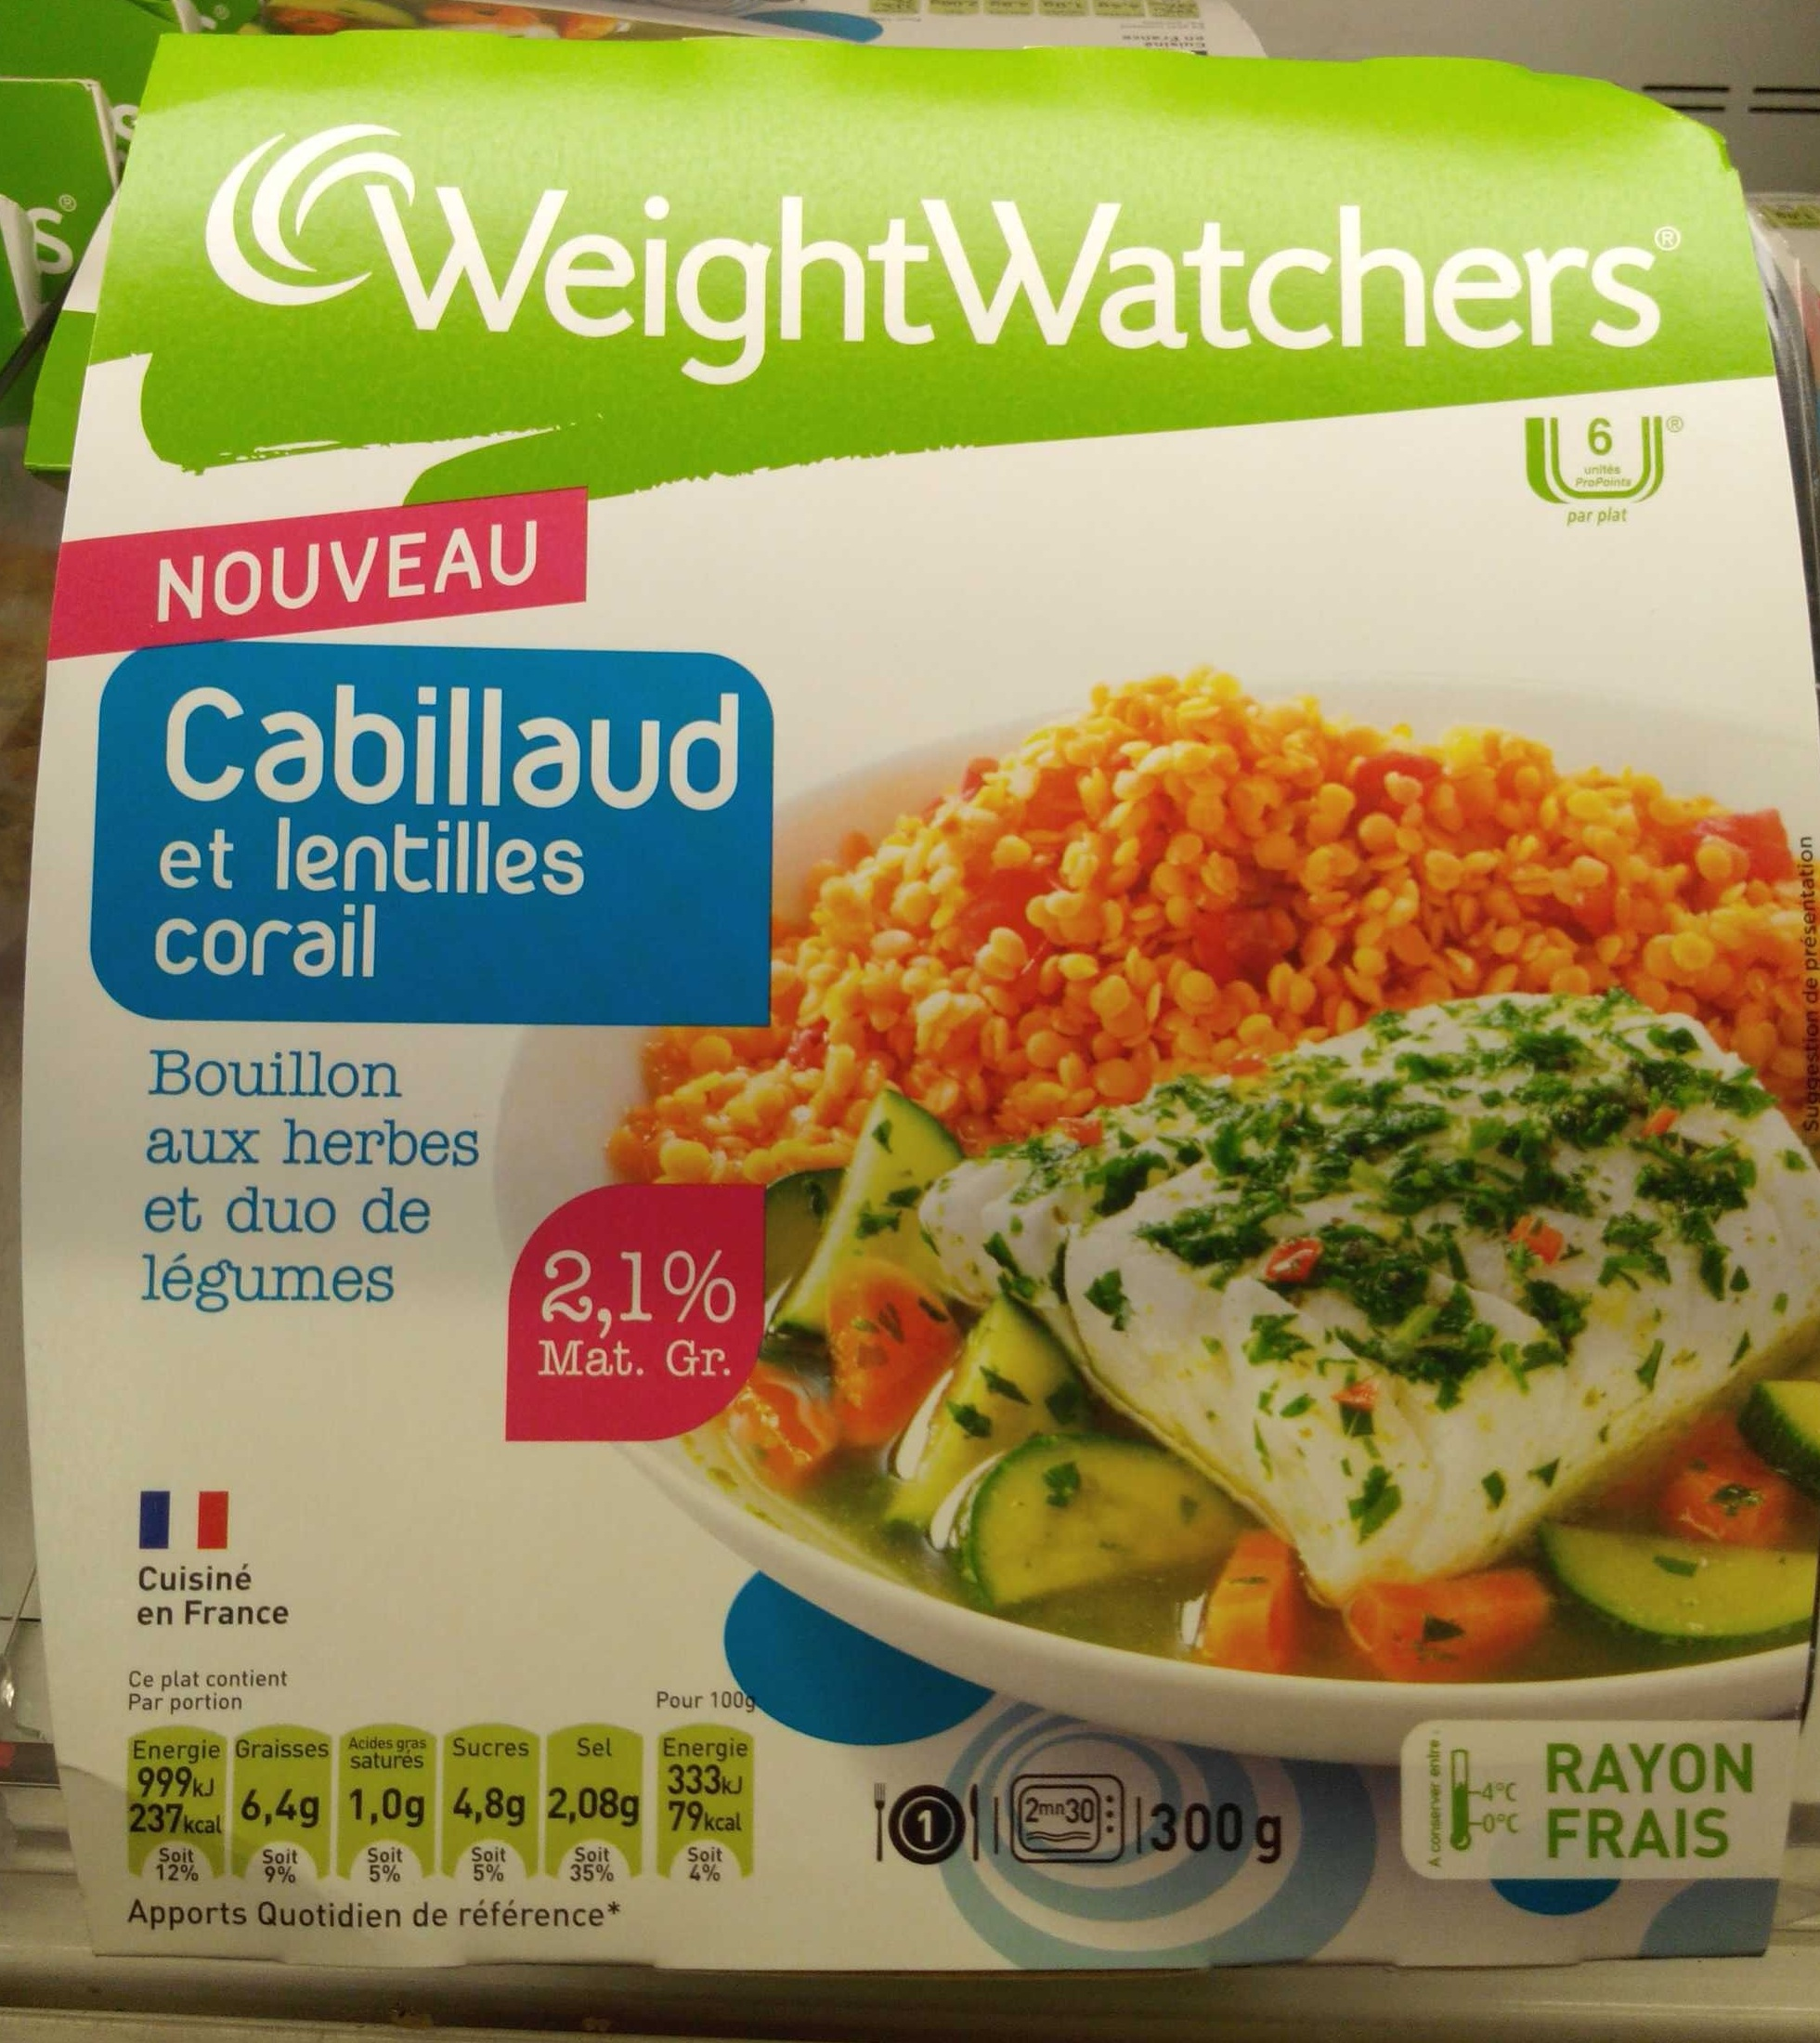 cabillaud et lentilles corail 2 1 mg weightwatchers 300 g 1 part. Black Bedroom Furniture Sets. Home Design Ideas